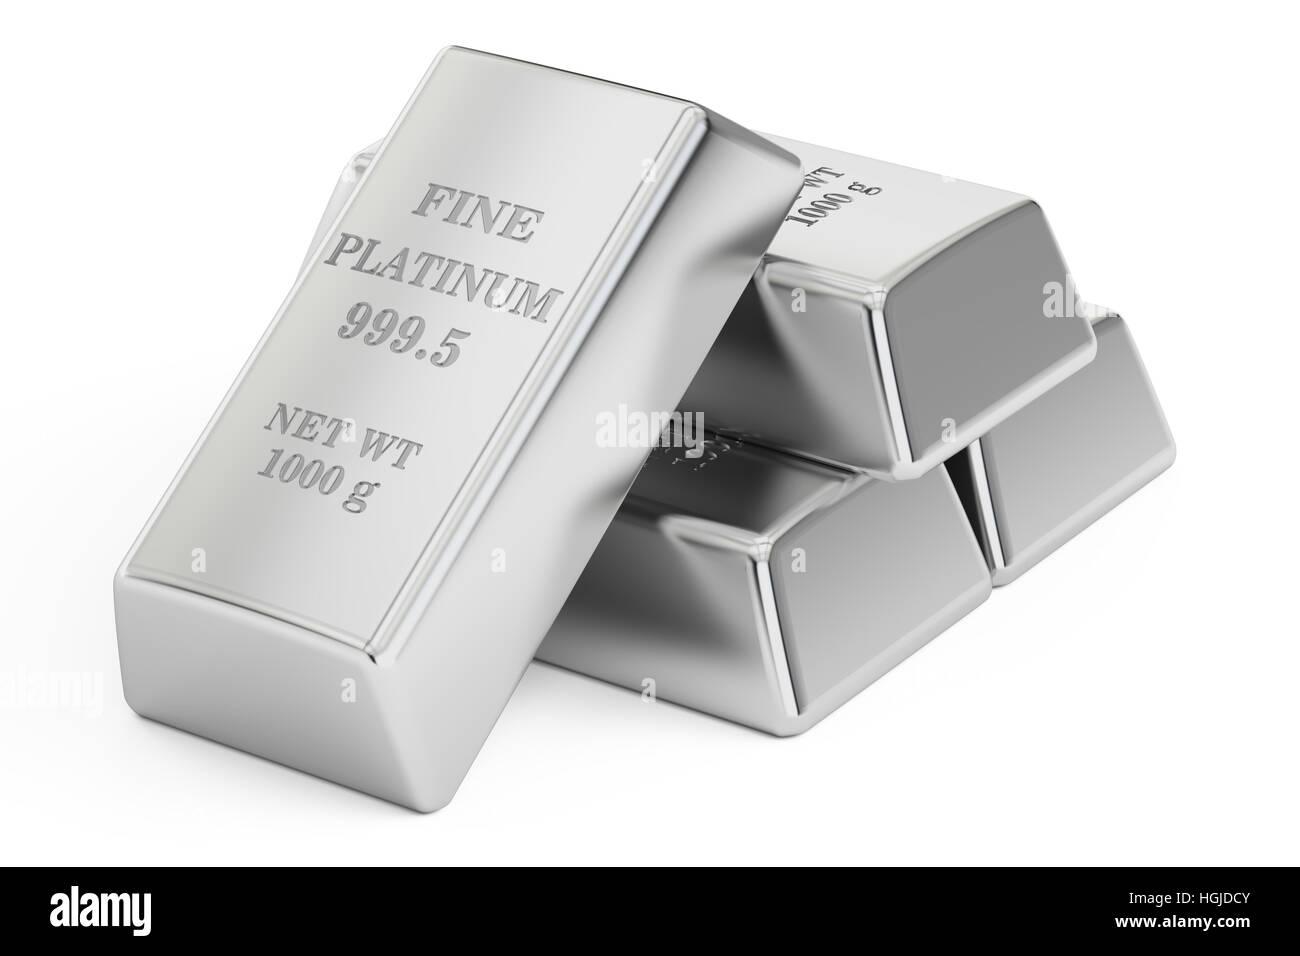 Platinum Metal Ingots Stock Photos & Platinum Metal Ingots ...